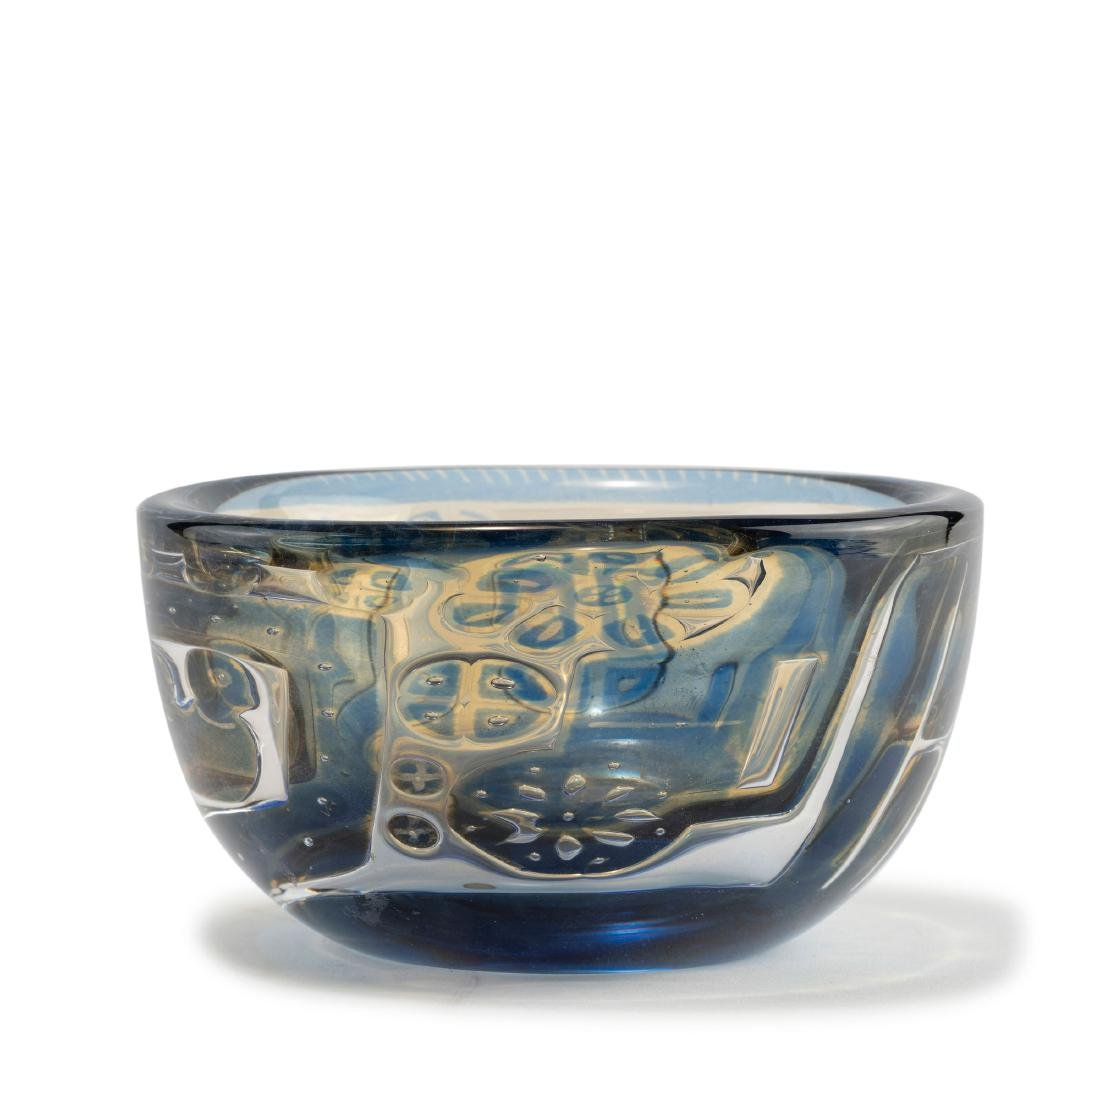 'Ariel' 'Dove' bowl, c. 1965